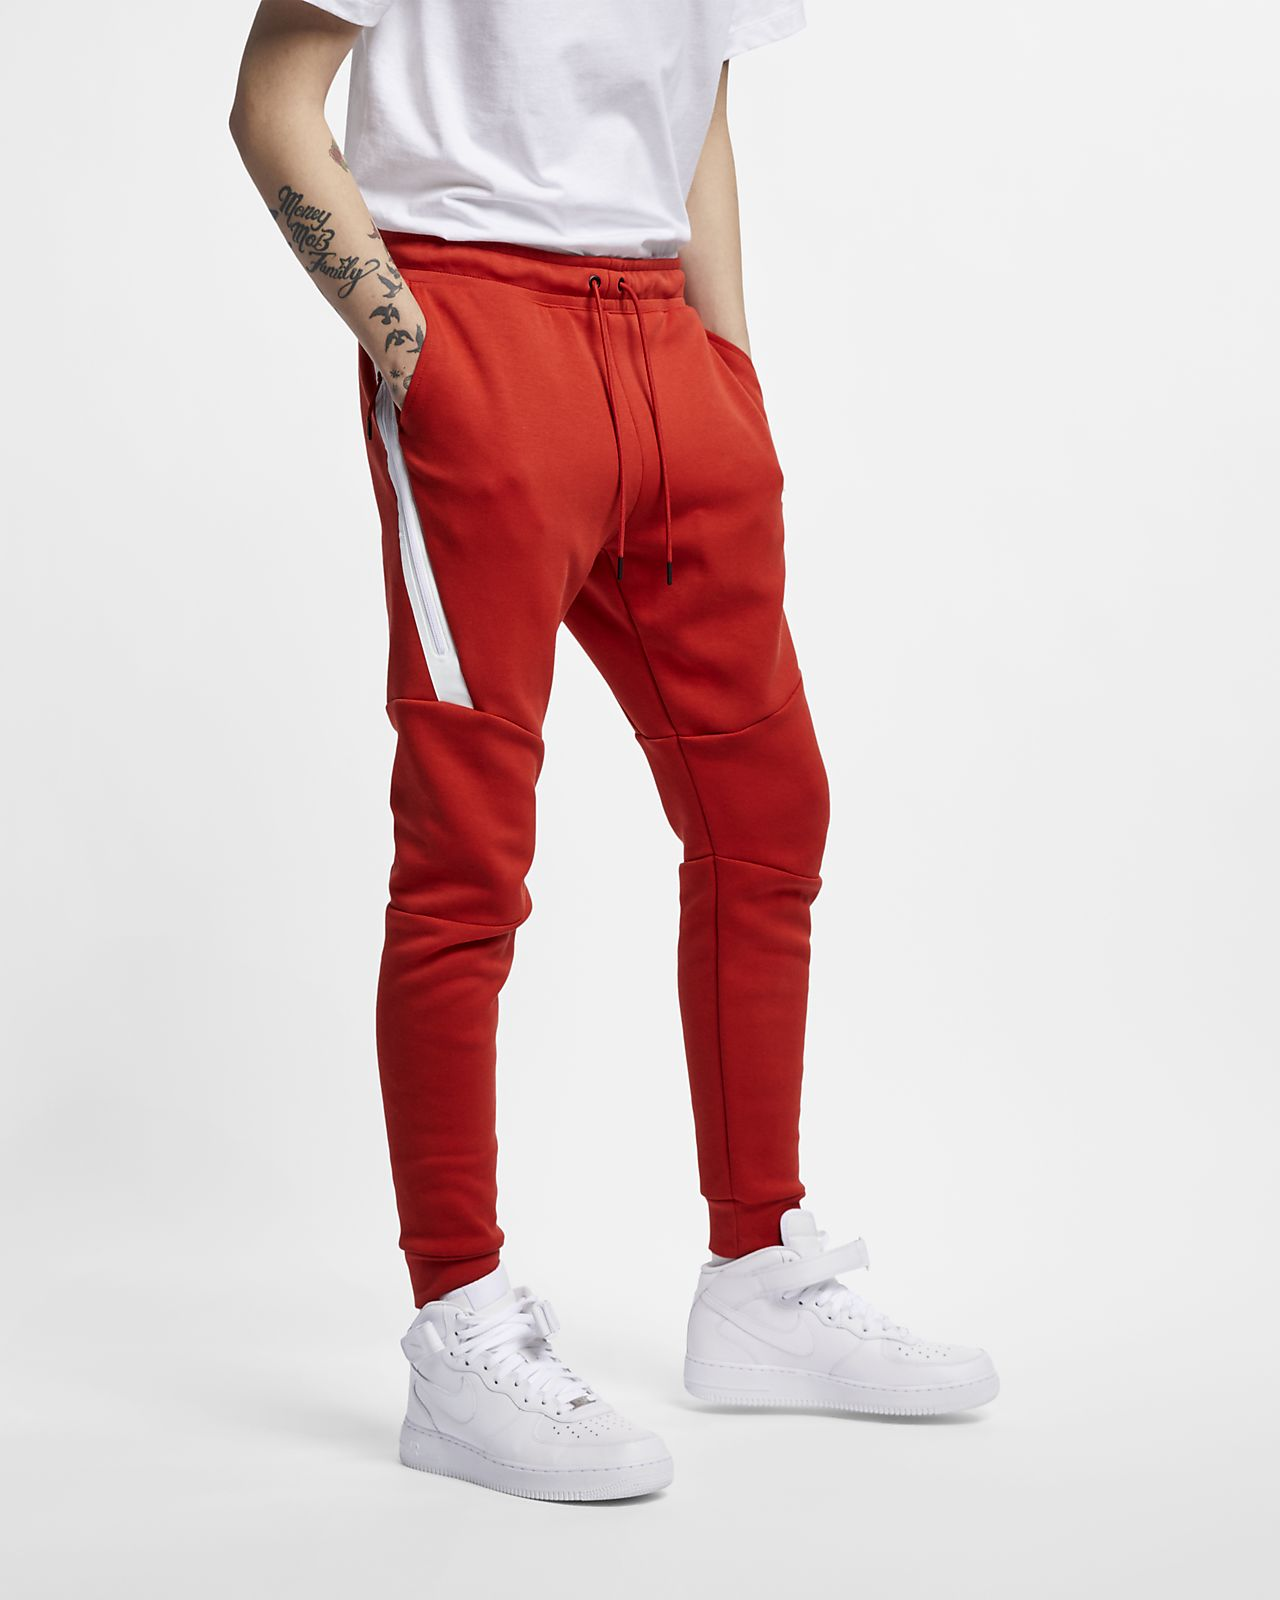 Tech Deportivos Fleece Hombre Para Sportswear Nike Pantalones qROaSxw